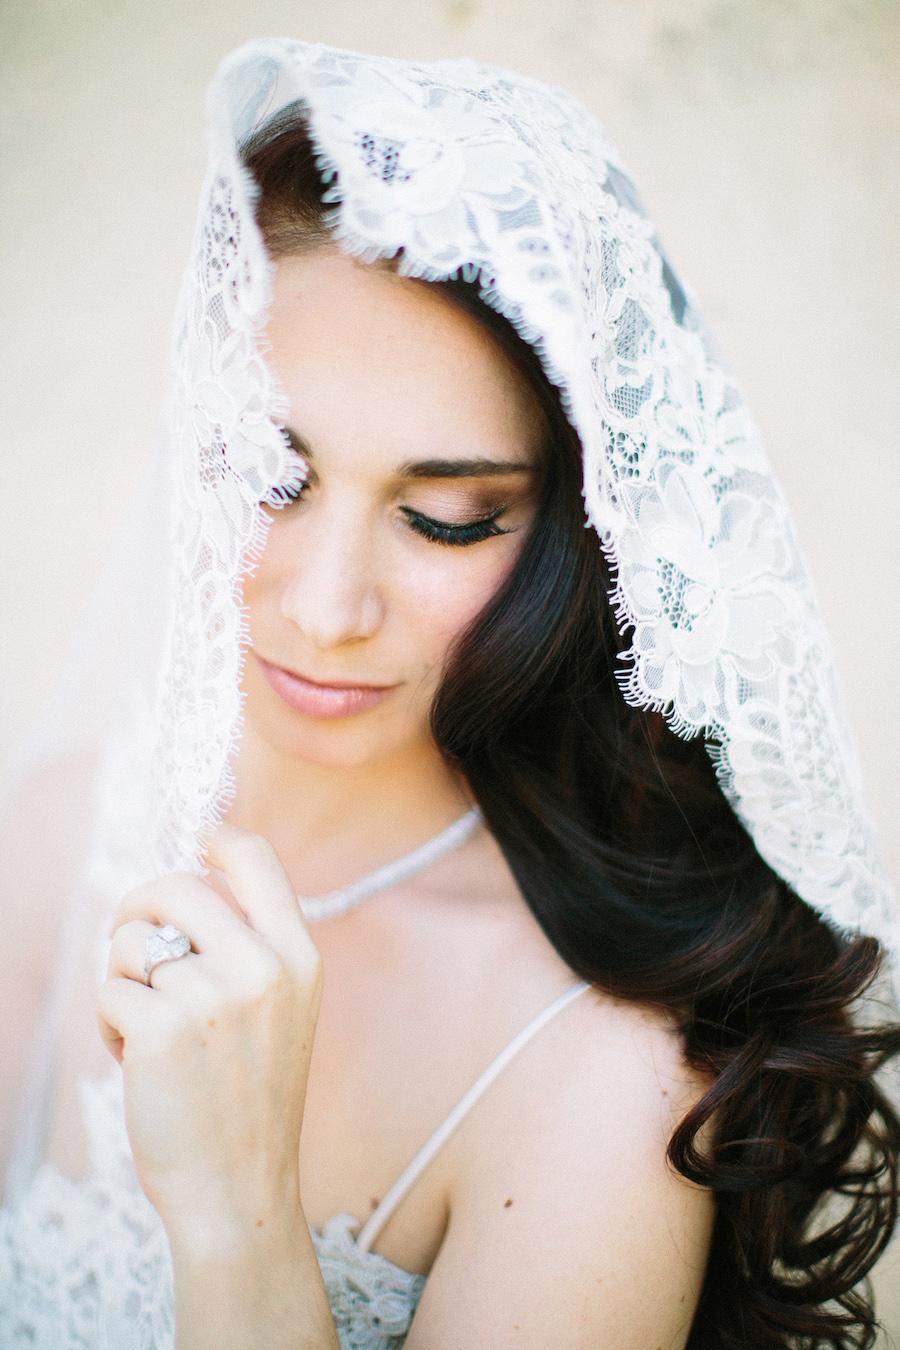 saya-photography-jewish-wedding-provence-rustic-lourmarin-le-galinier-36.jpg